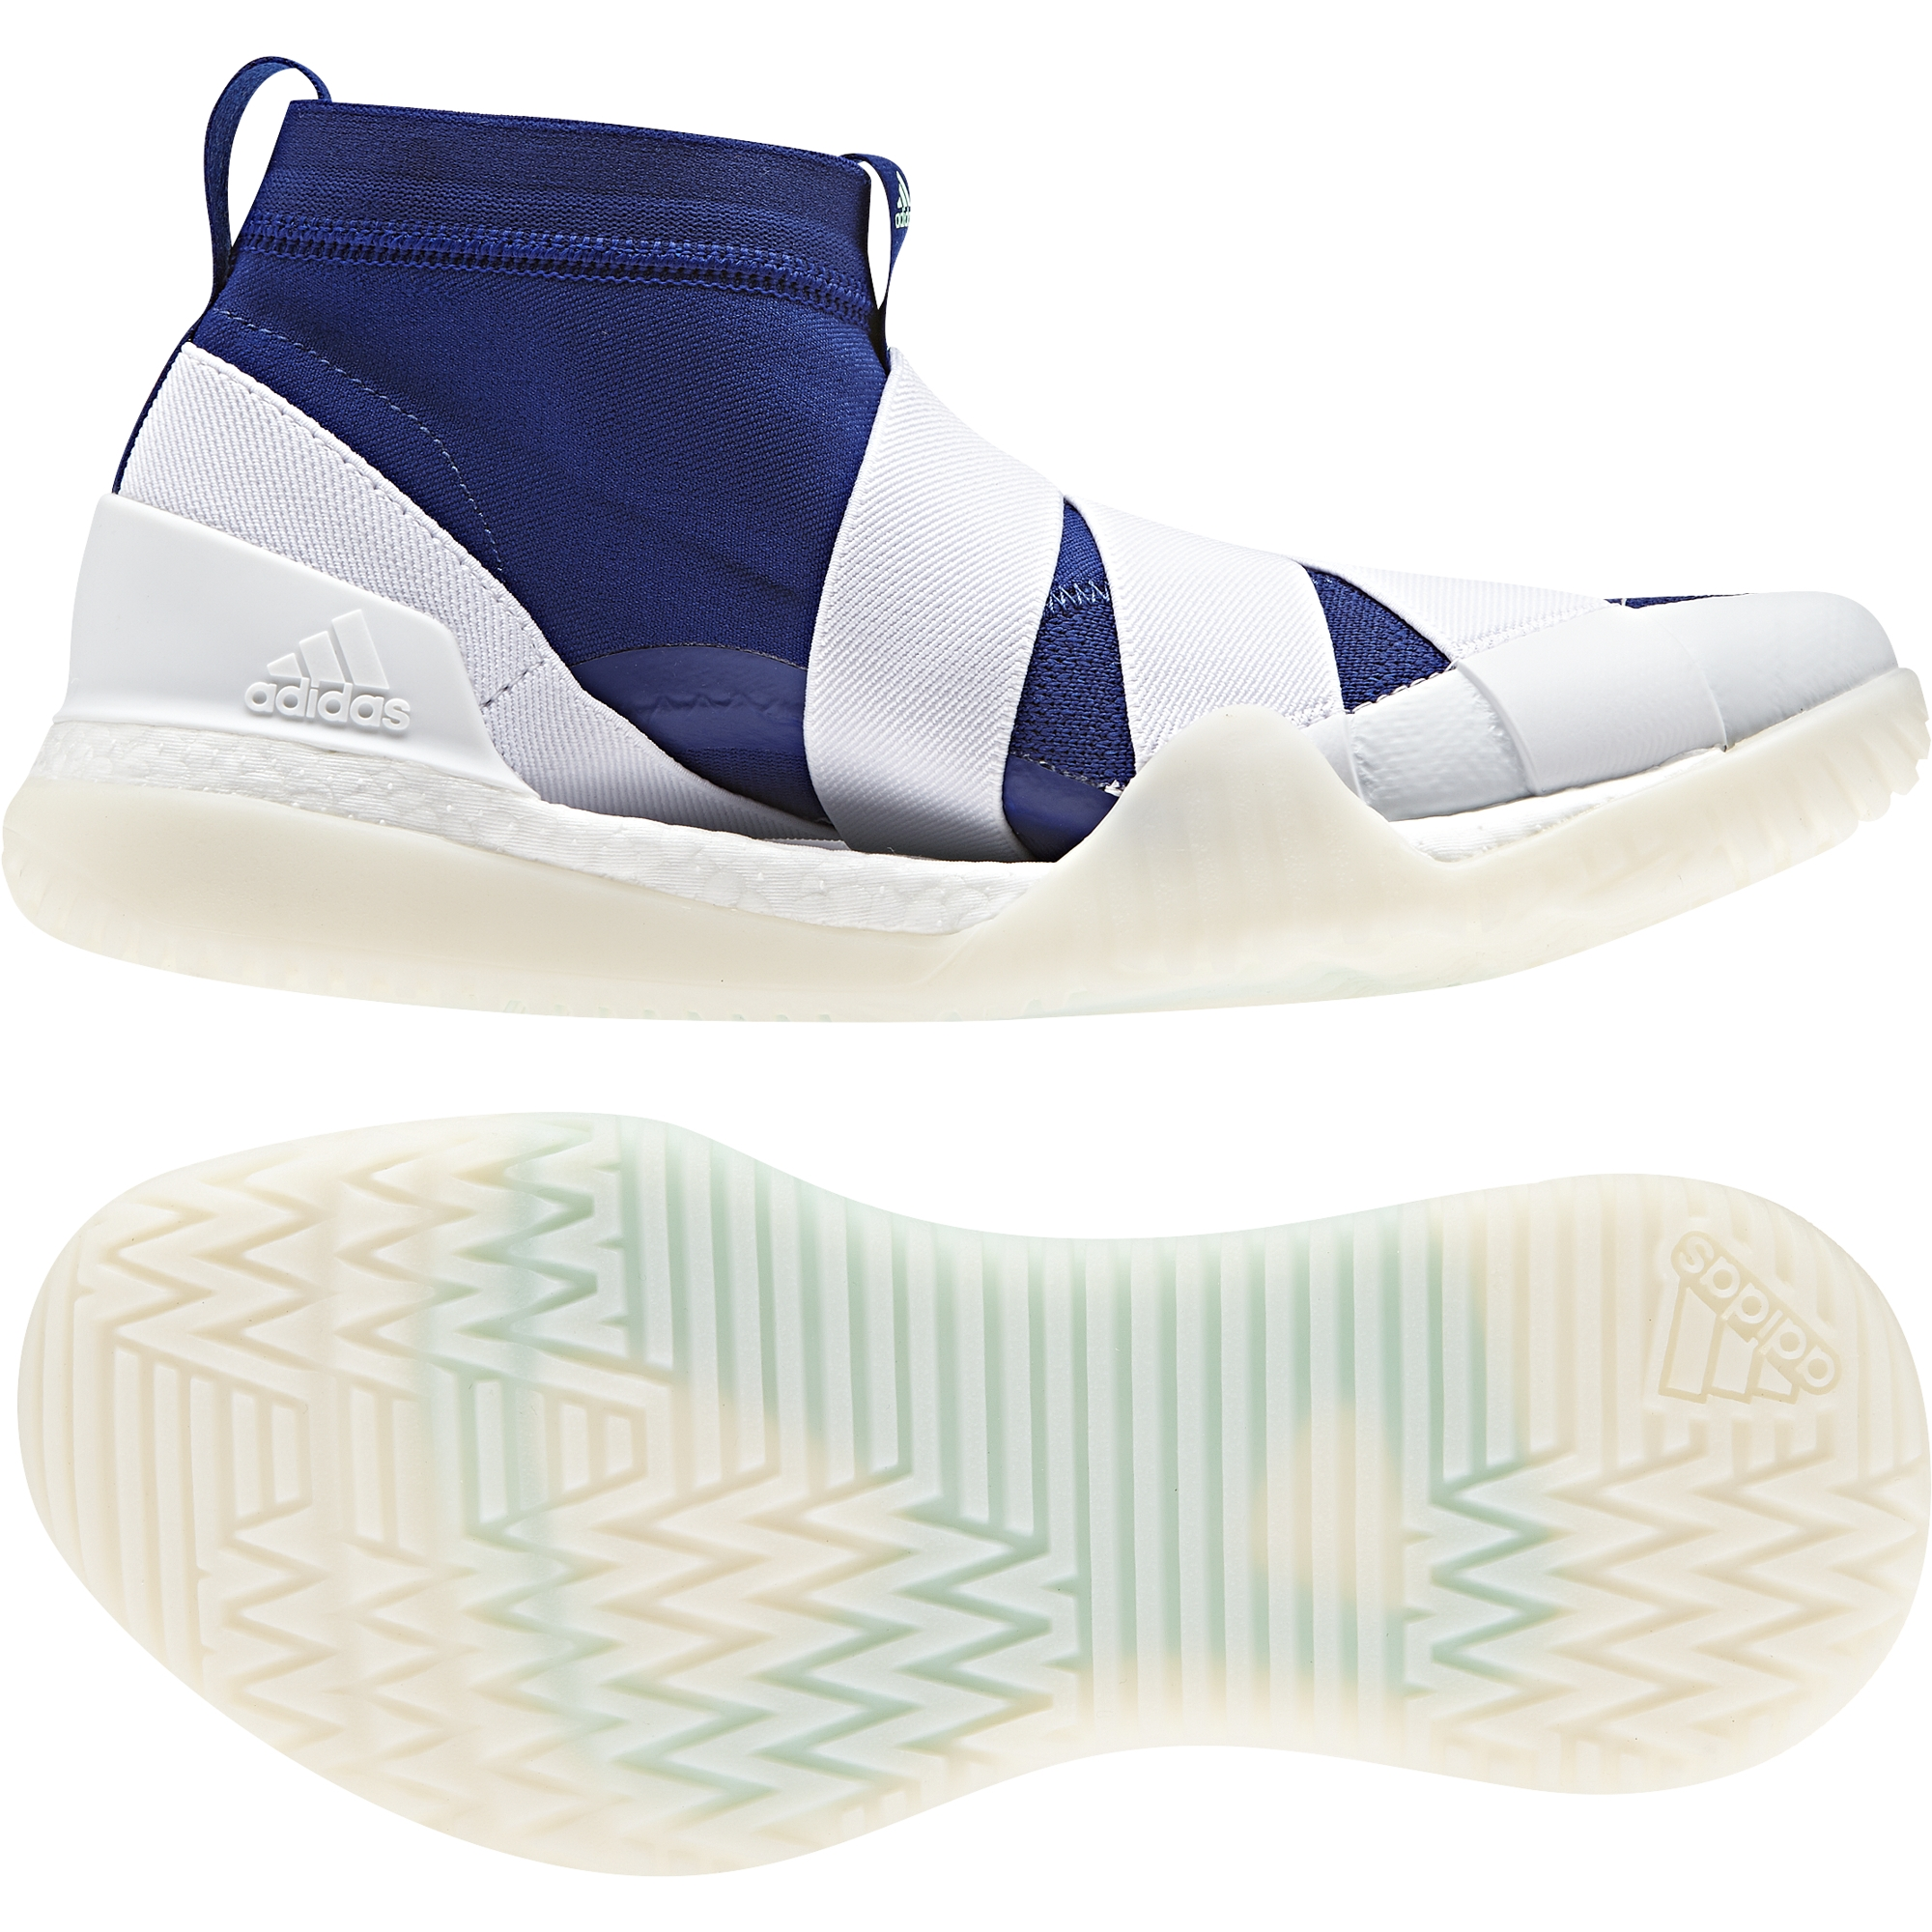 check out a716e be6de Chaussures femme adidas Pureboost X TR 3.0 LL